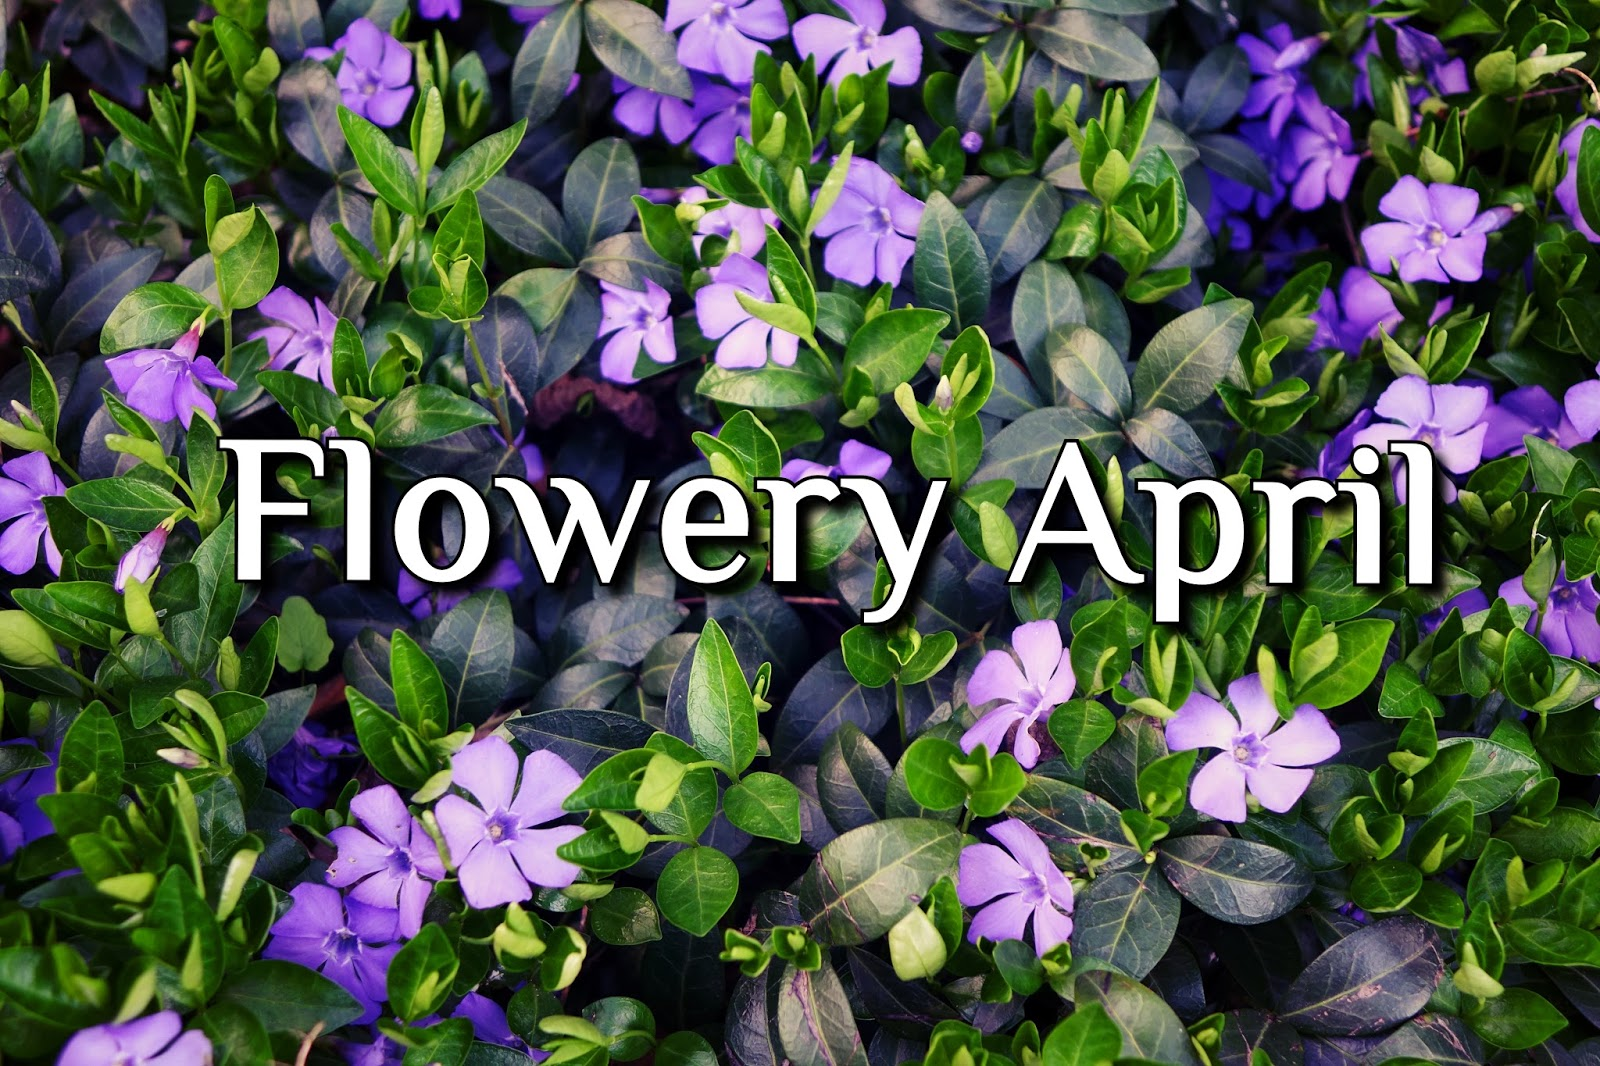 Flowery April